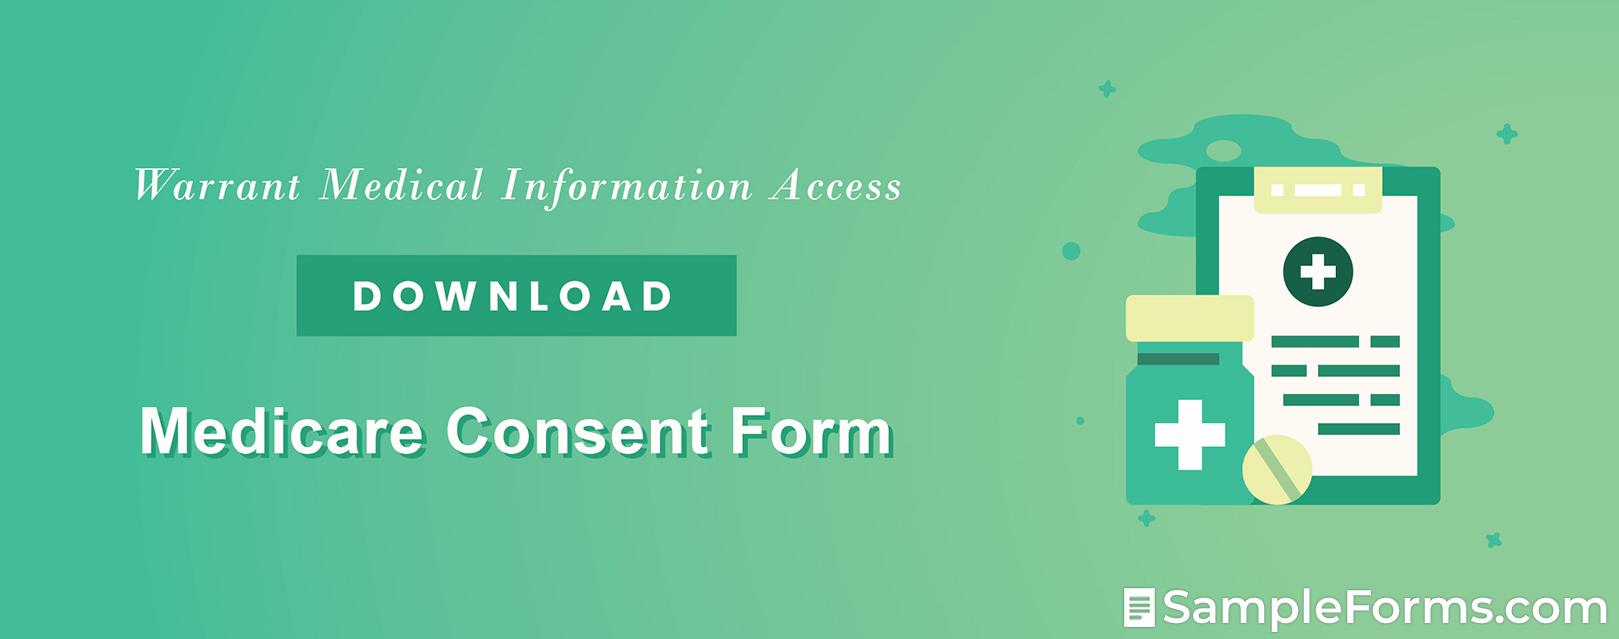 Medicare Consent Form1